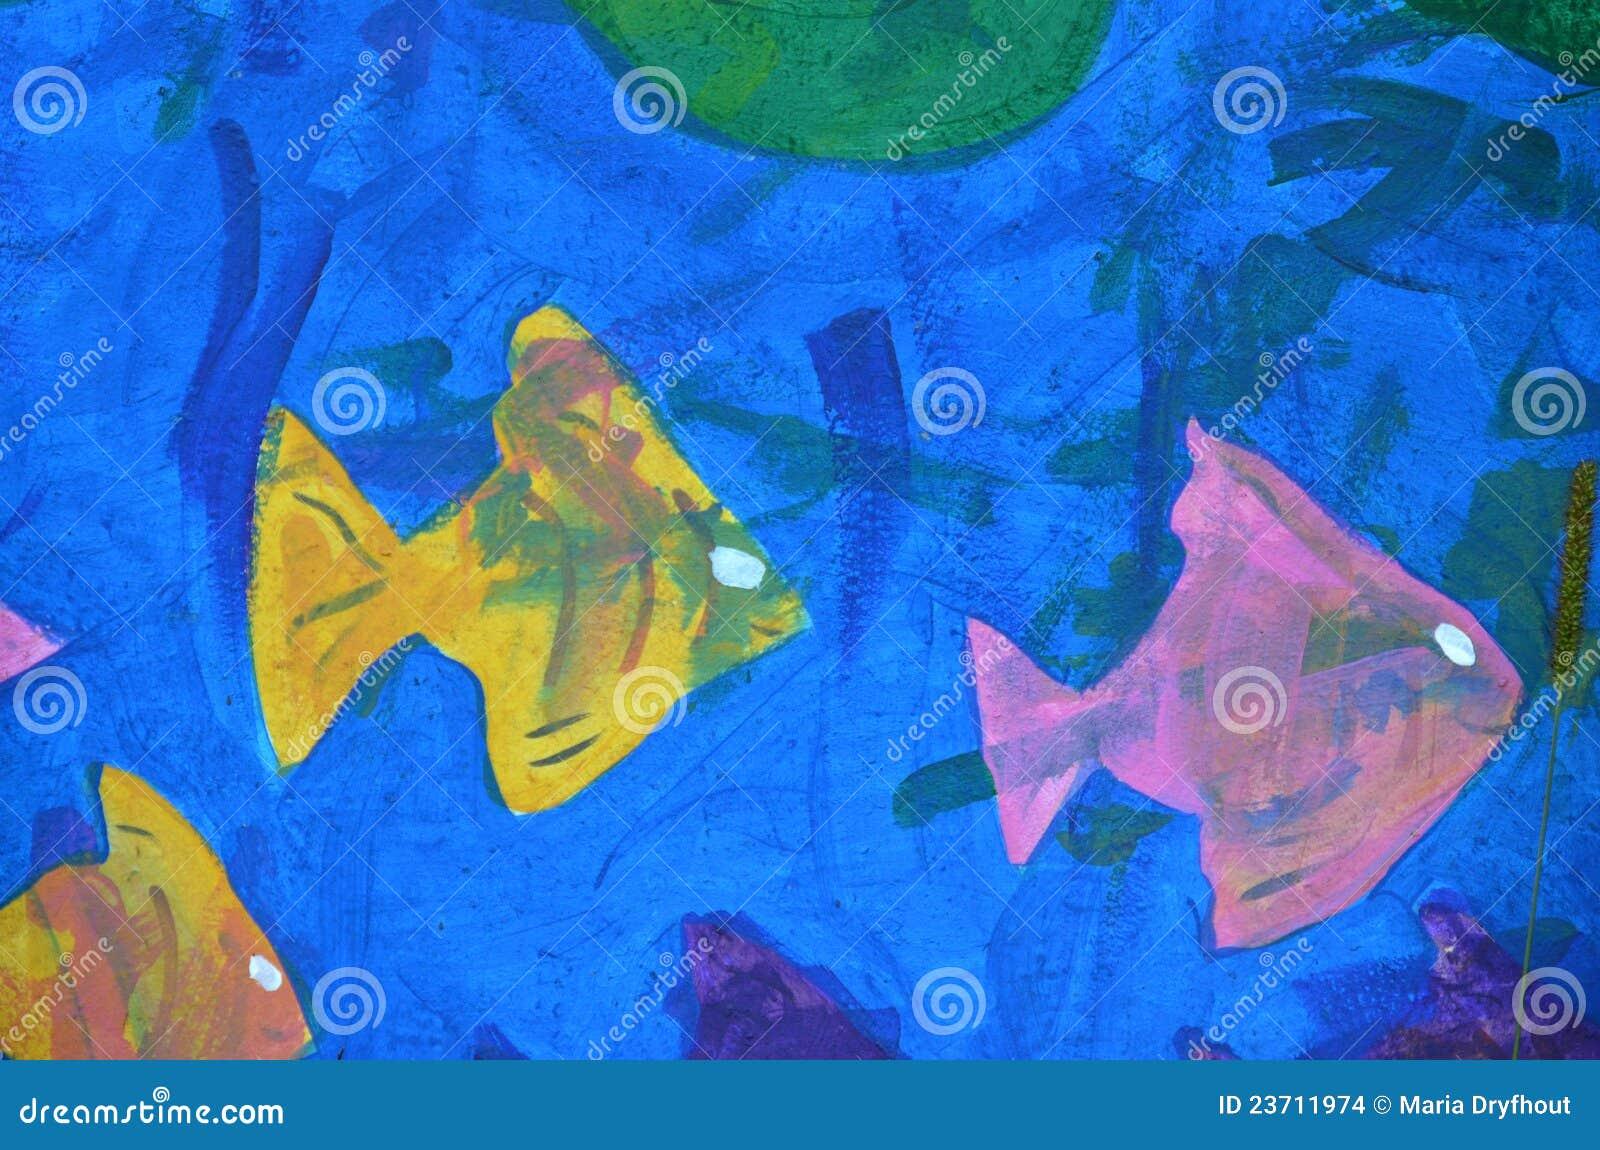 Abstract fish designs - photo#3